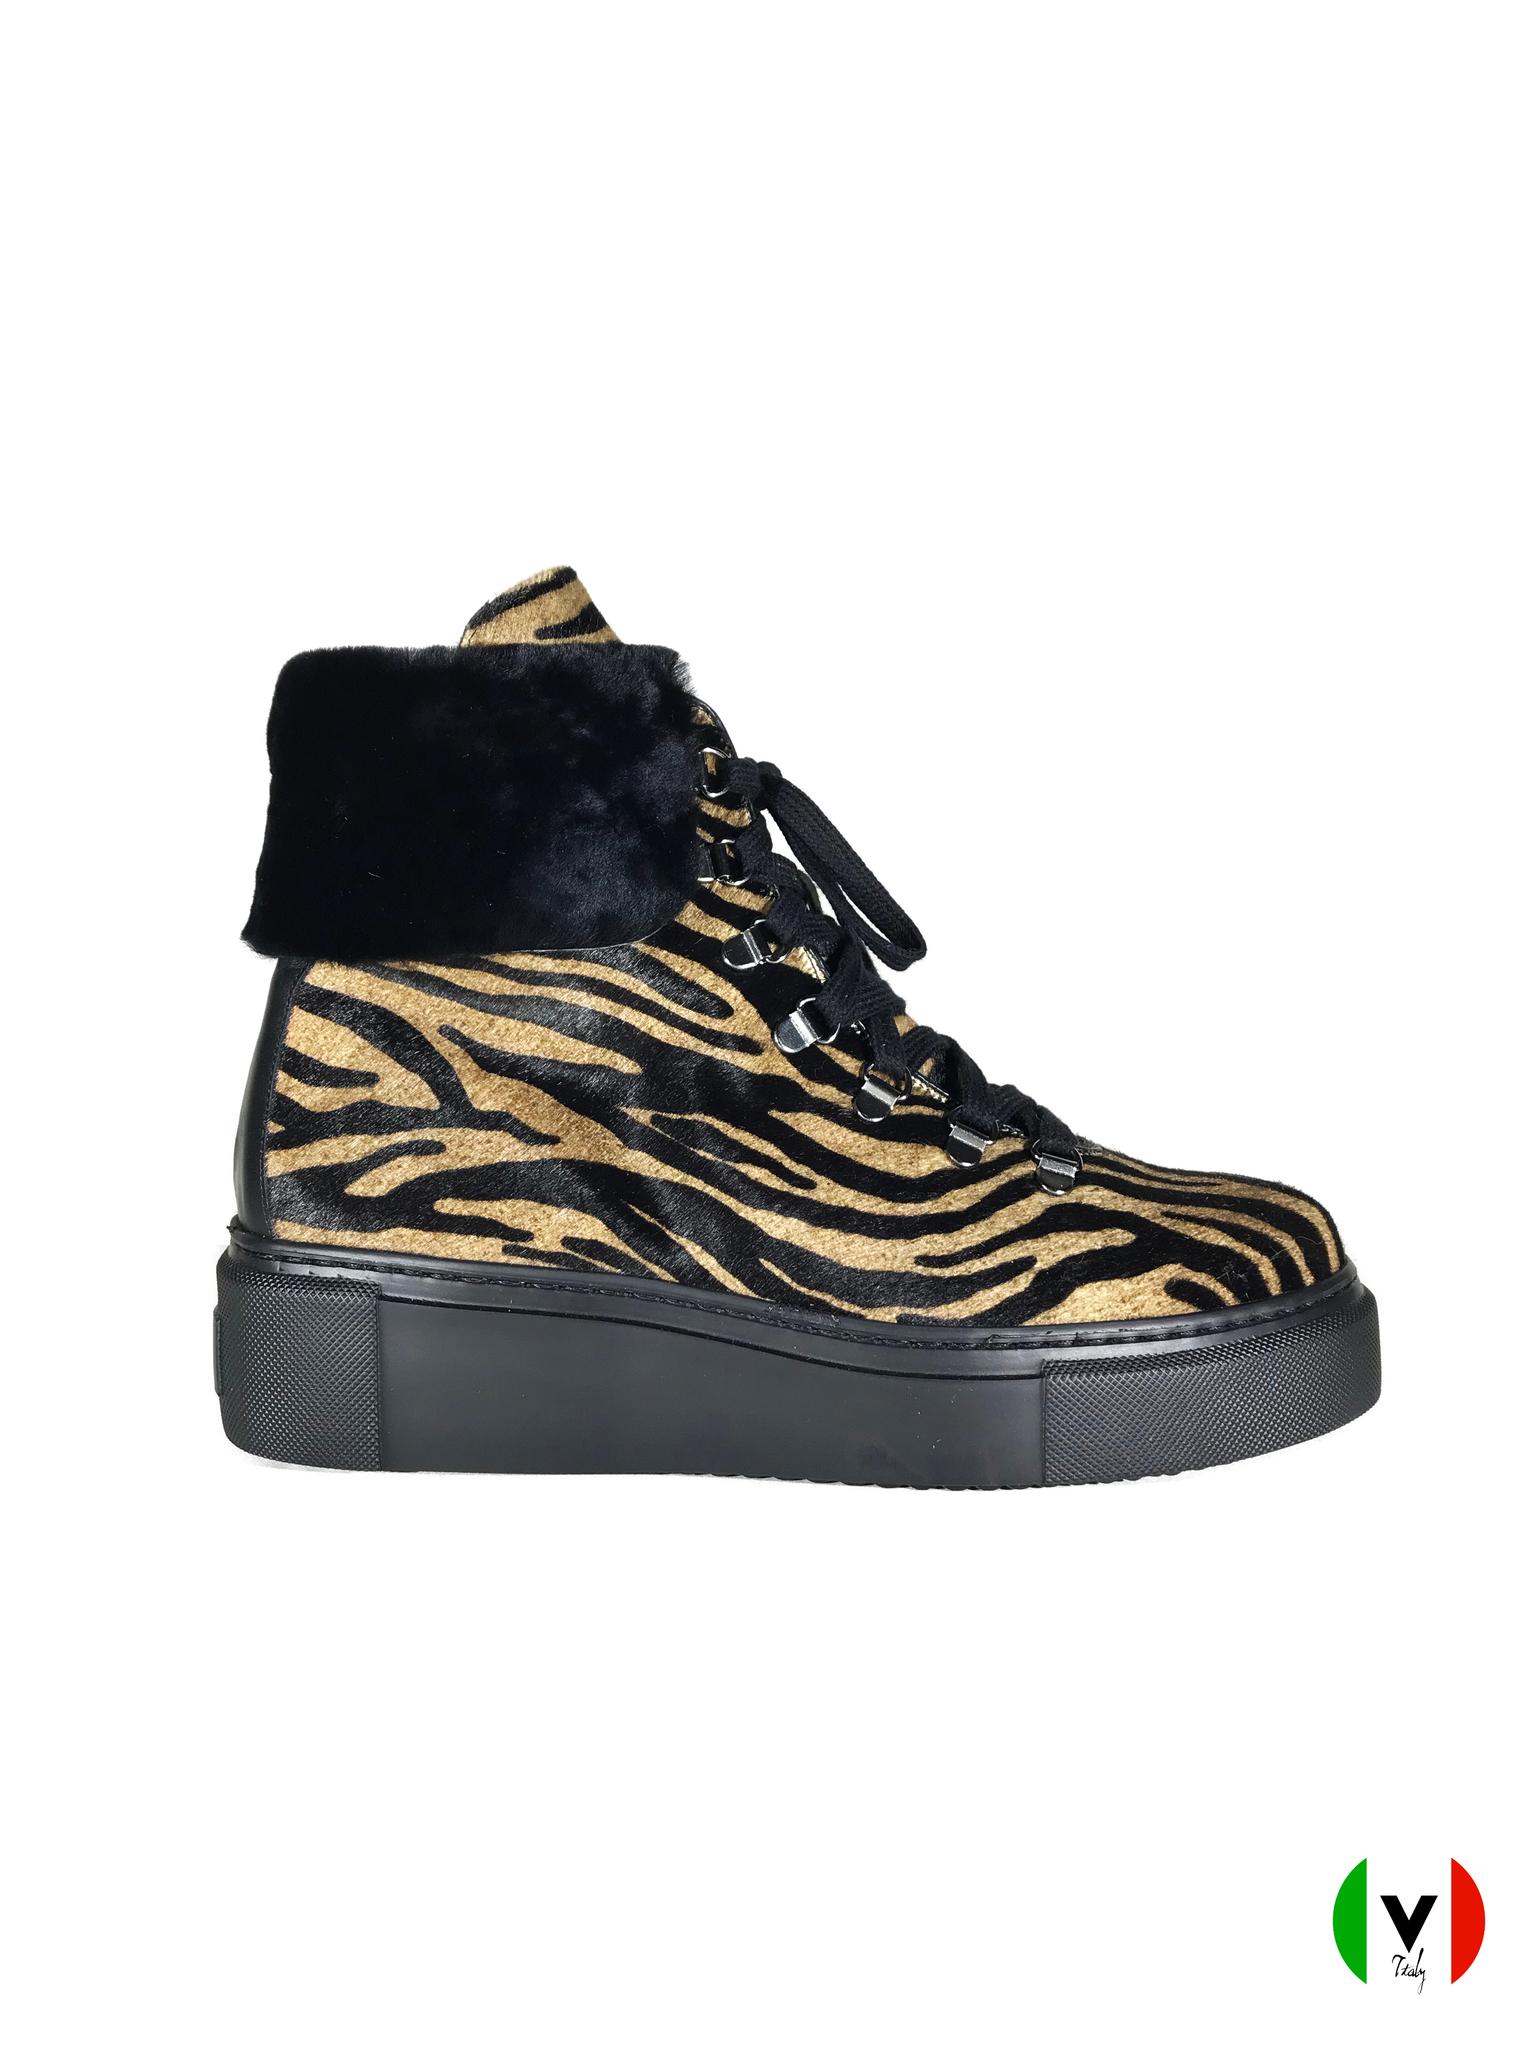 Зимние ботинки Laura Bellariva зебра 2105-zebra, артикул 2105, сезон зима, цвет чёрный, материал кожа наплак, мех каваллино, цена 19 500 руб., veroitaly.ru